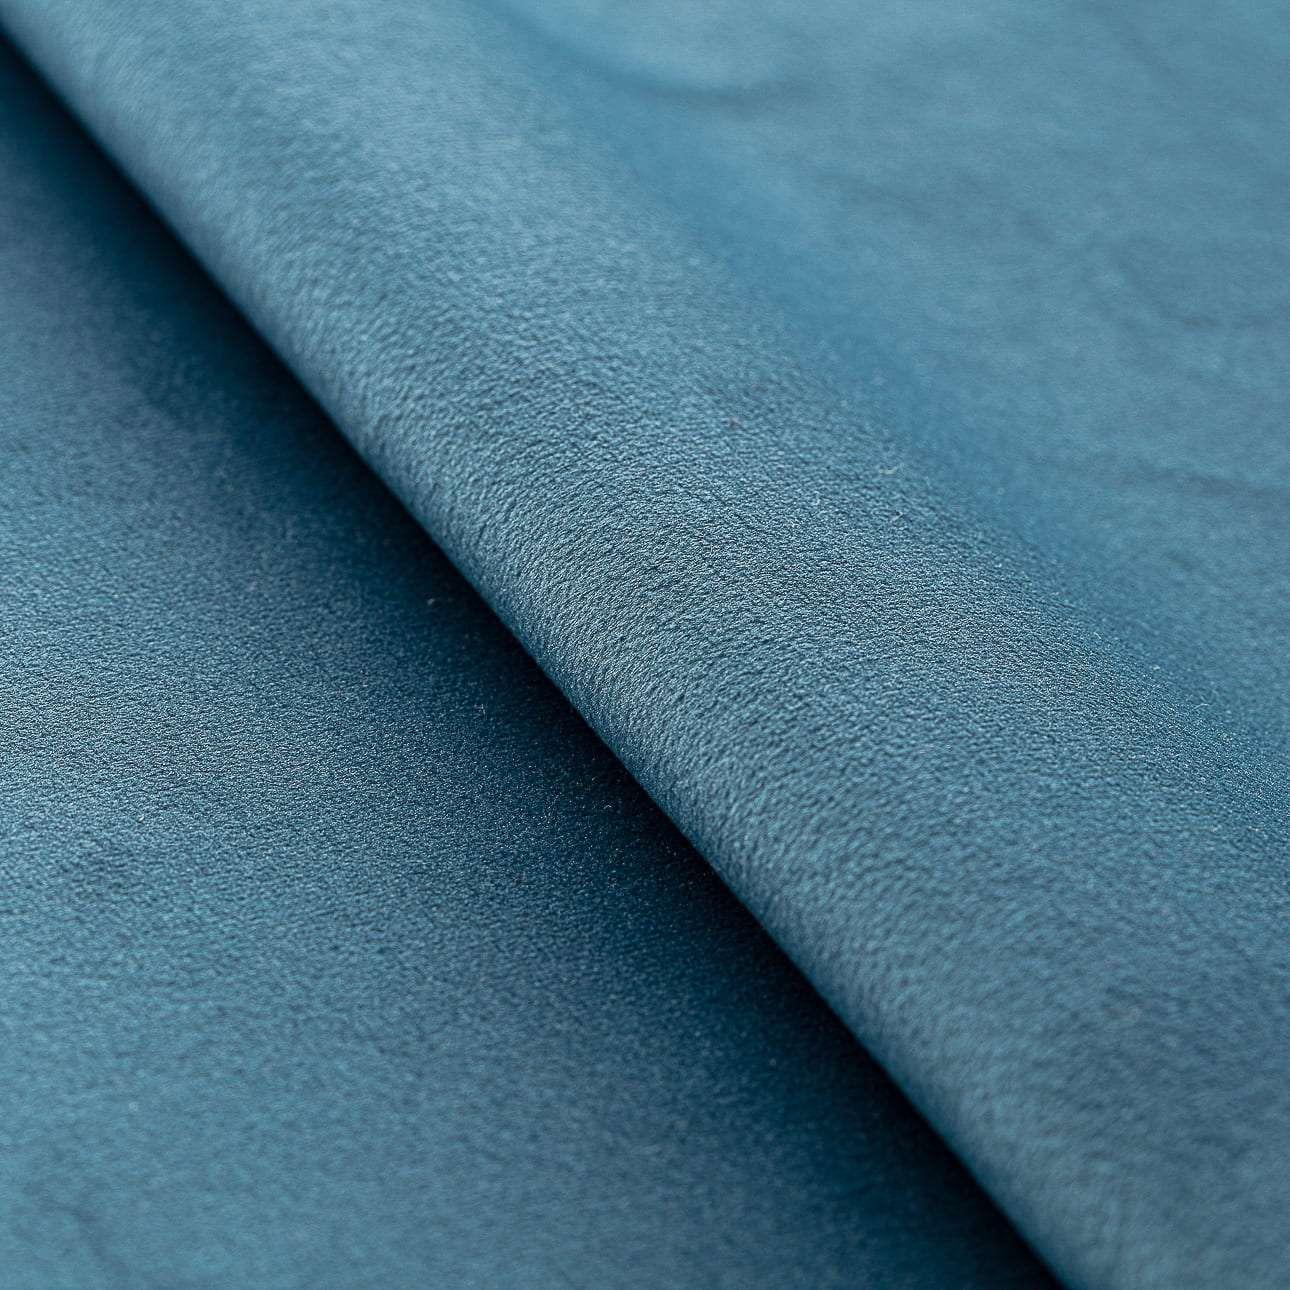 Zaves s riasením WAVE V kolekcii Velvet, tkanina: 704-16